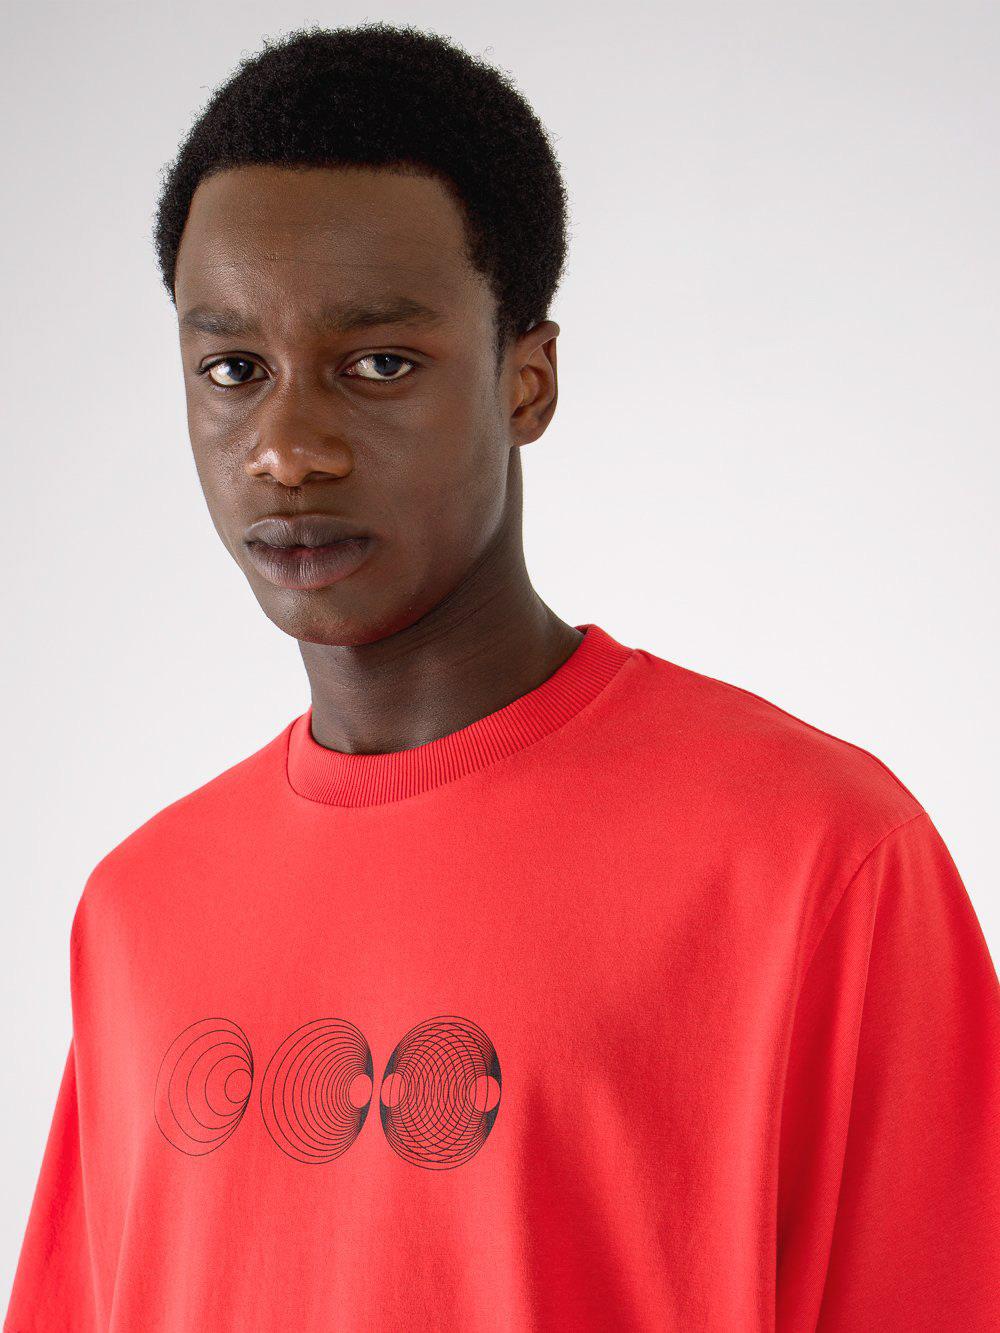 Image may contain: person, man and active shirt